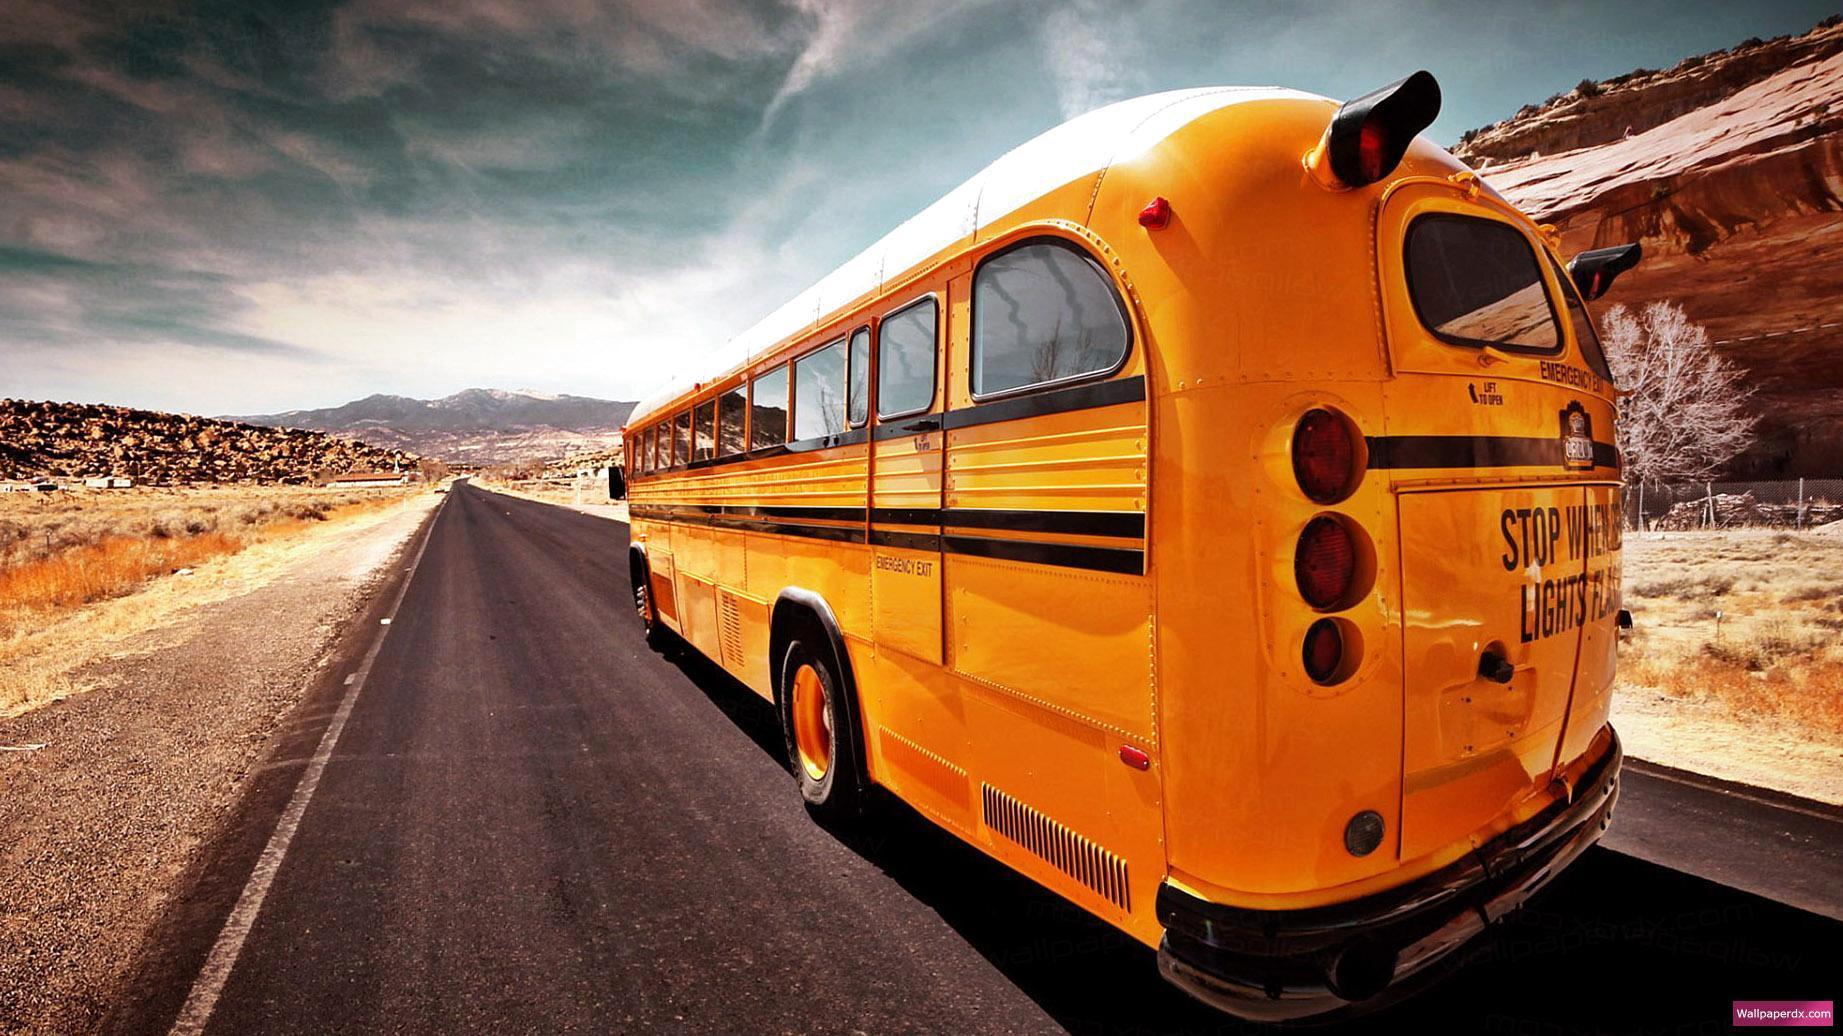 Gallery For gt School Bus Wallpaper 1843x1036